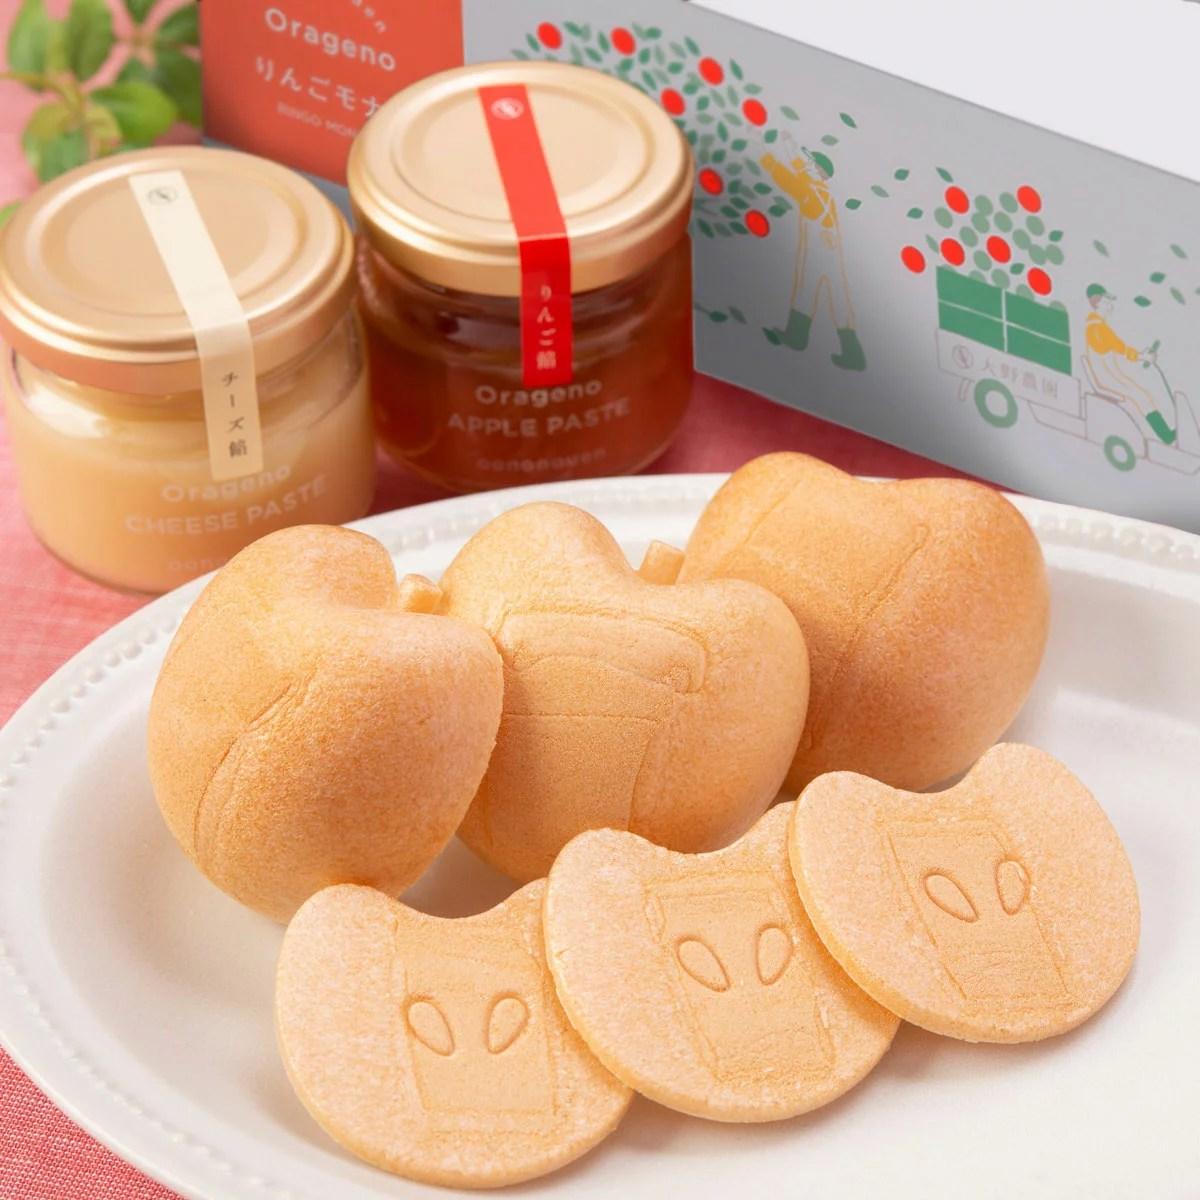 APPLE MONAKA BOX 2個 詰合せ 最中 和菓子 もなか りんご餡 りんご 果肉 チーズ